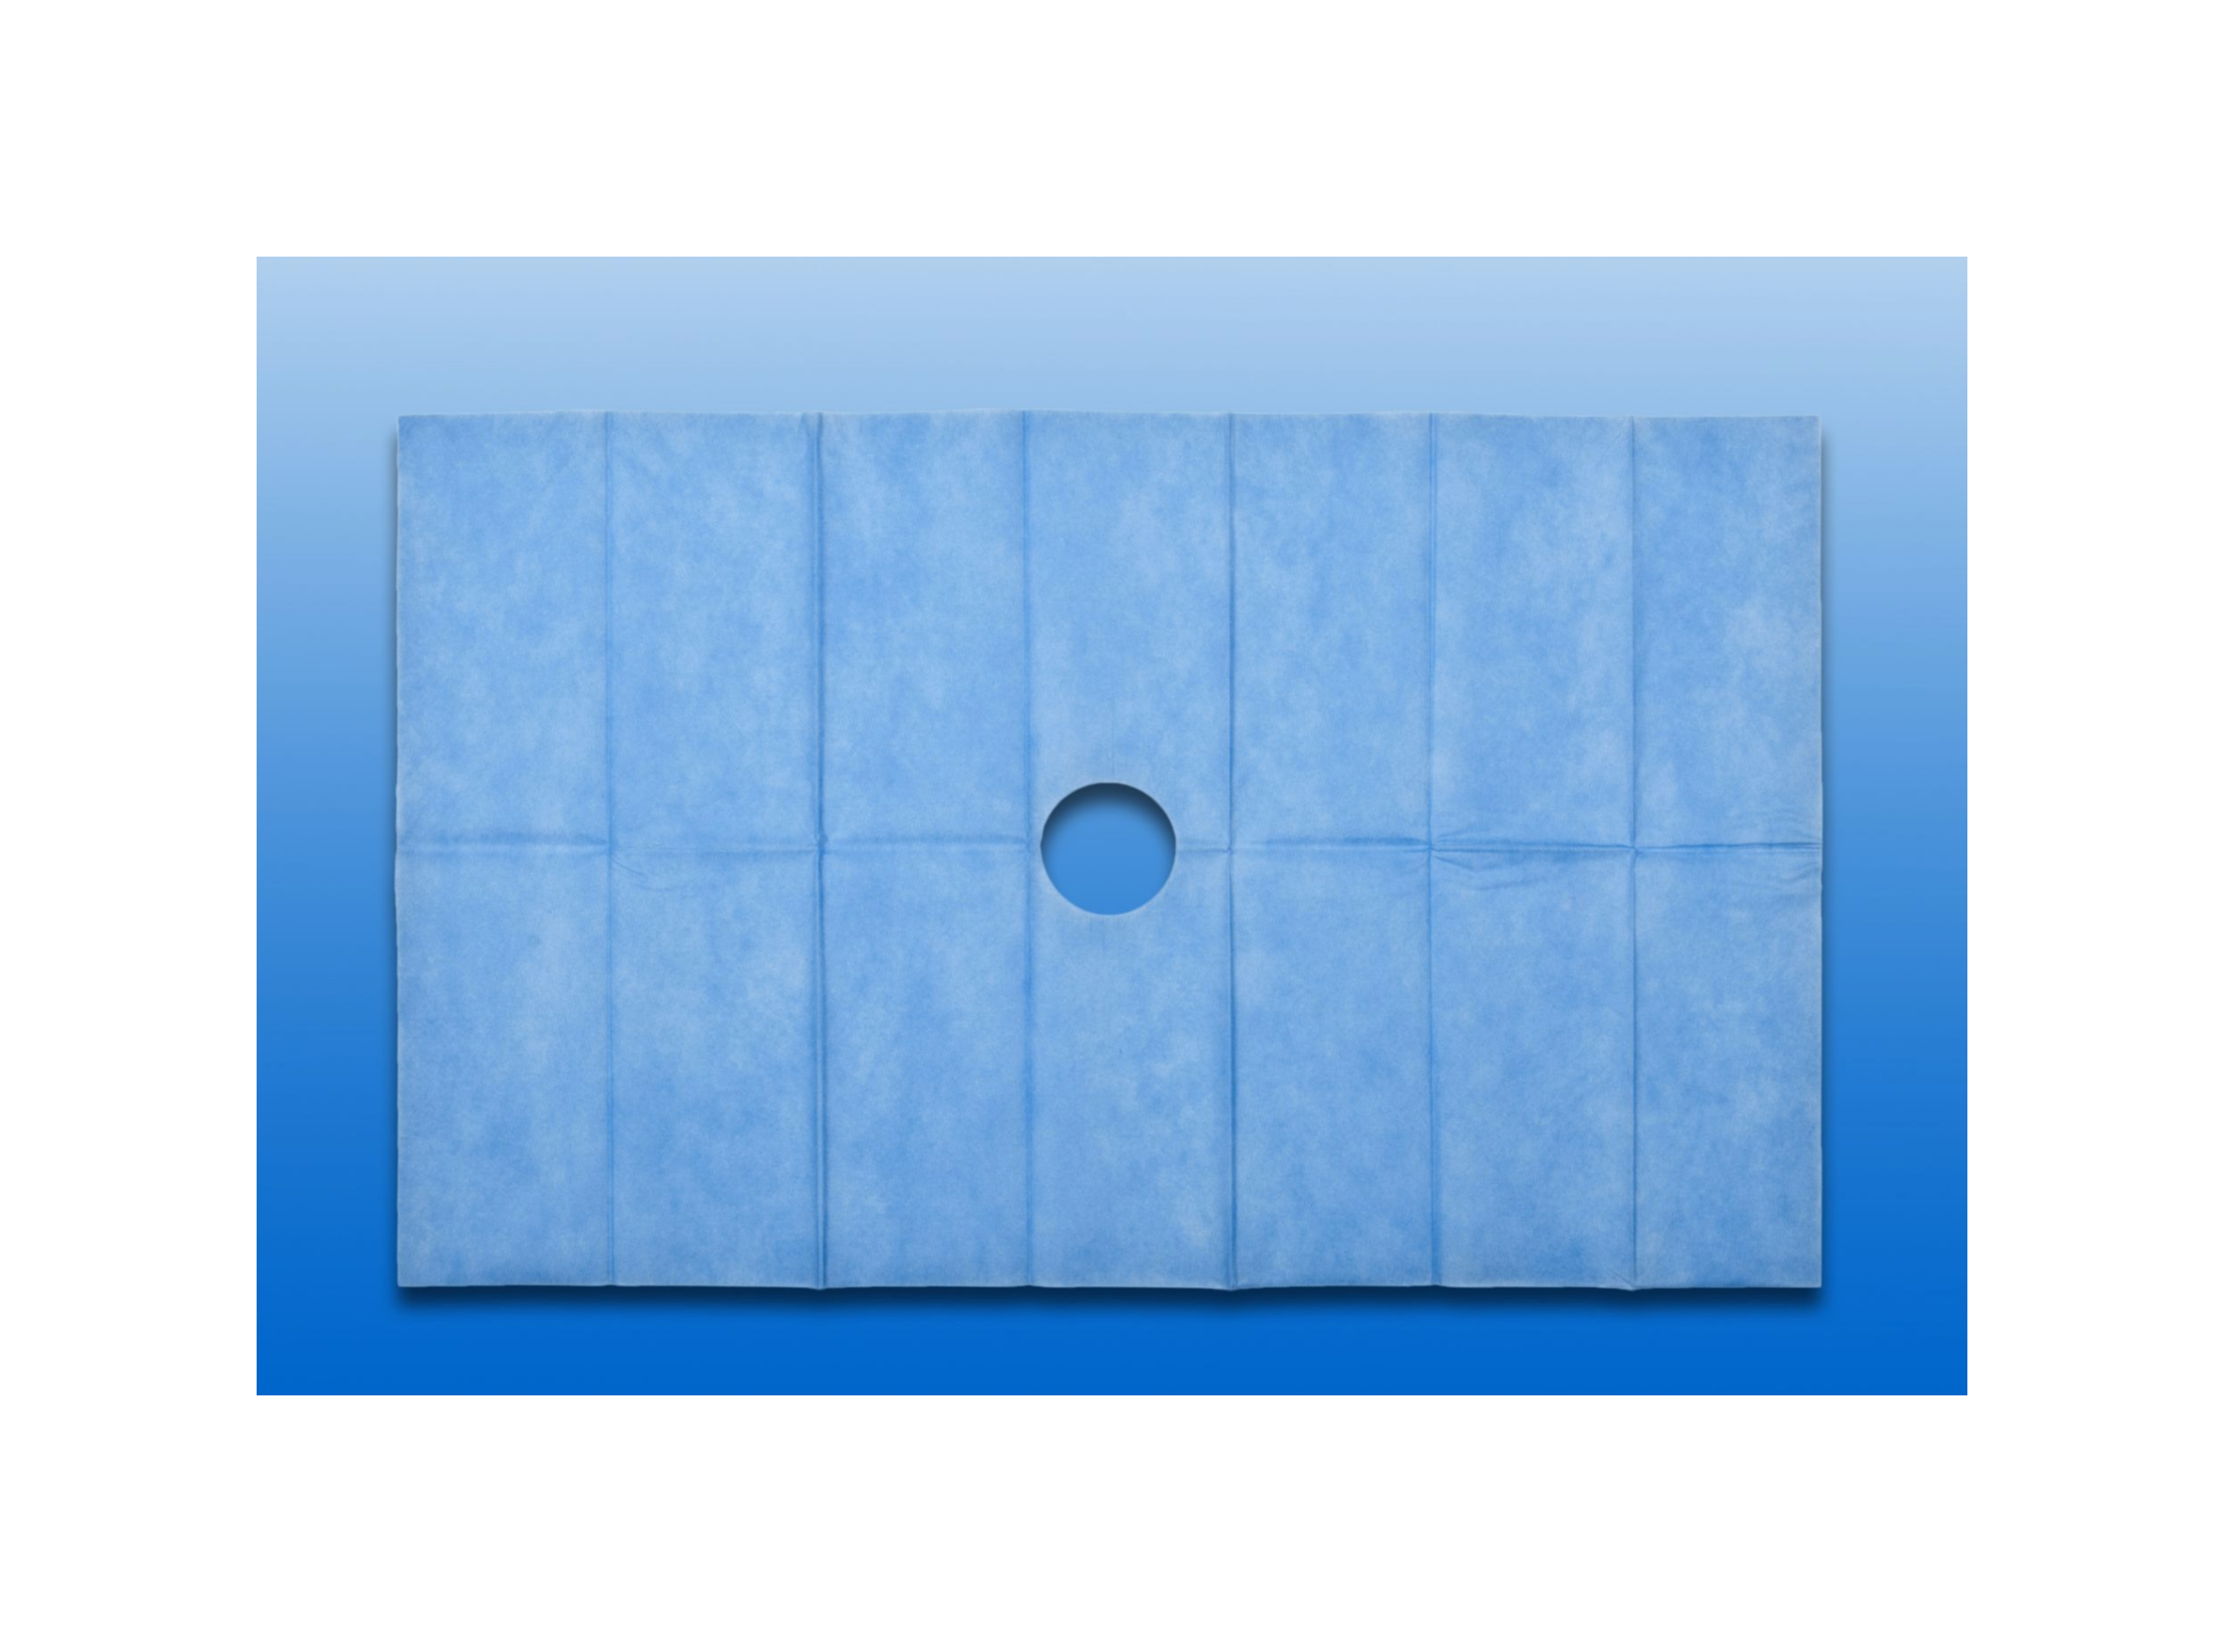 NOBADRAPE selbstklebendes Lochtuch, 45 x 75 cm in blau, 1 Stück